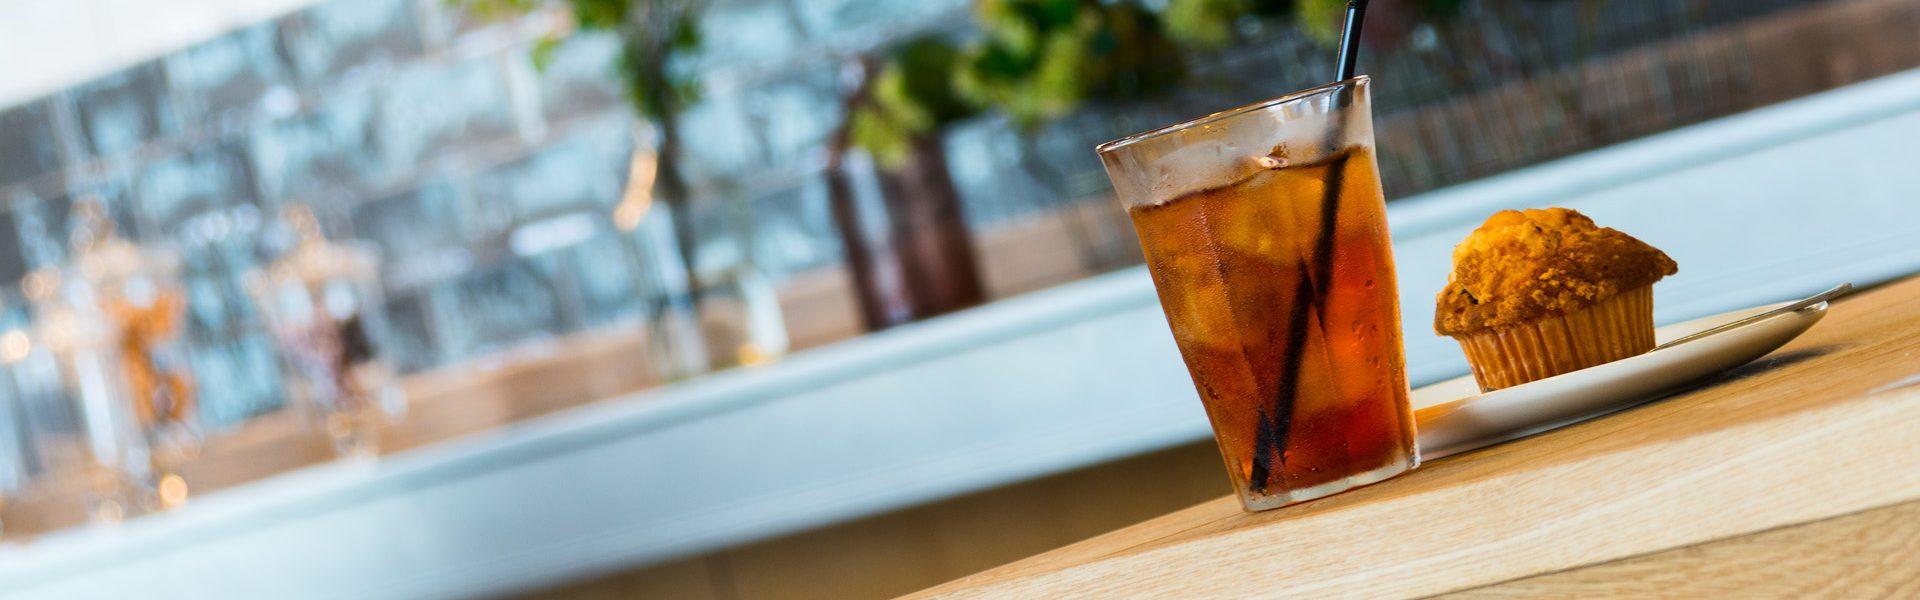 &Tea | アンドティー | 紅茶の専門店 produced by TSC, Inc